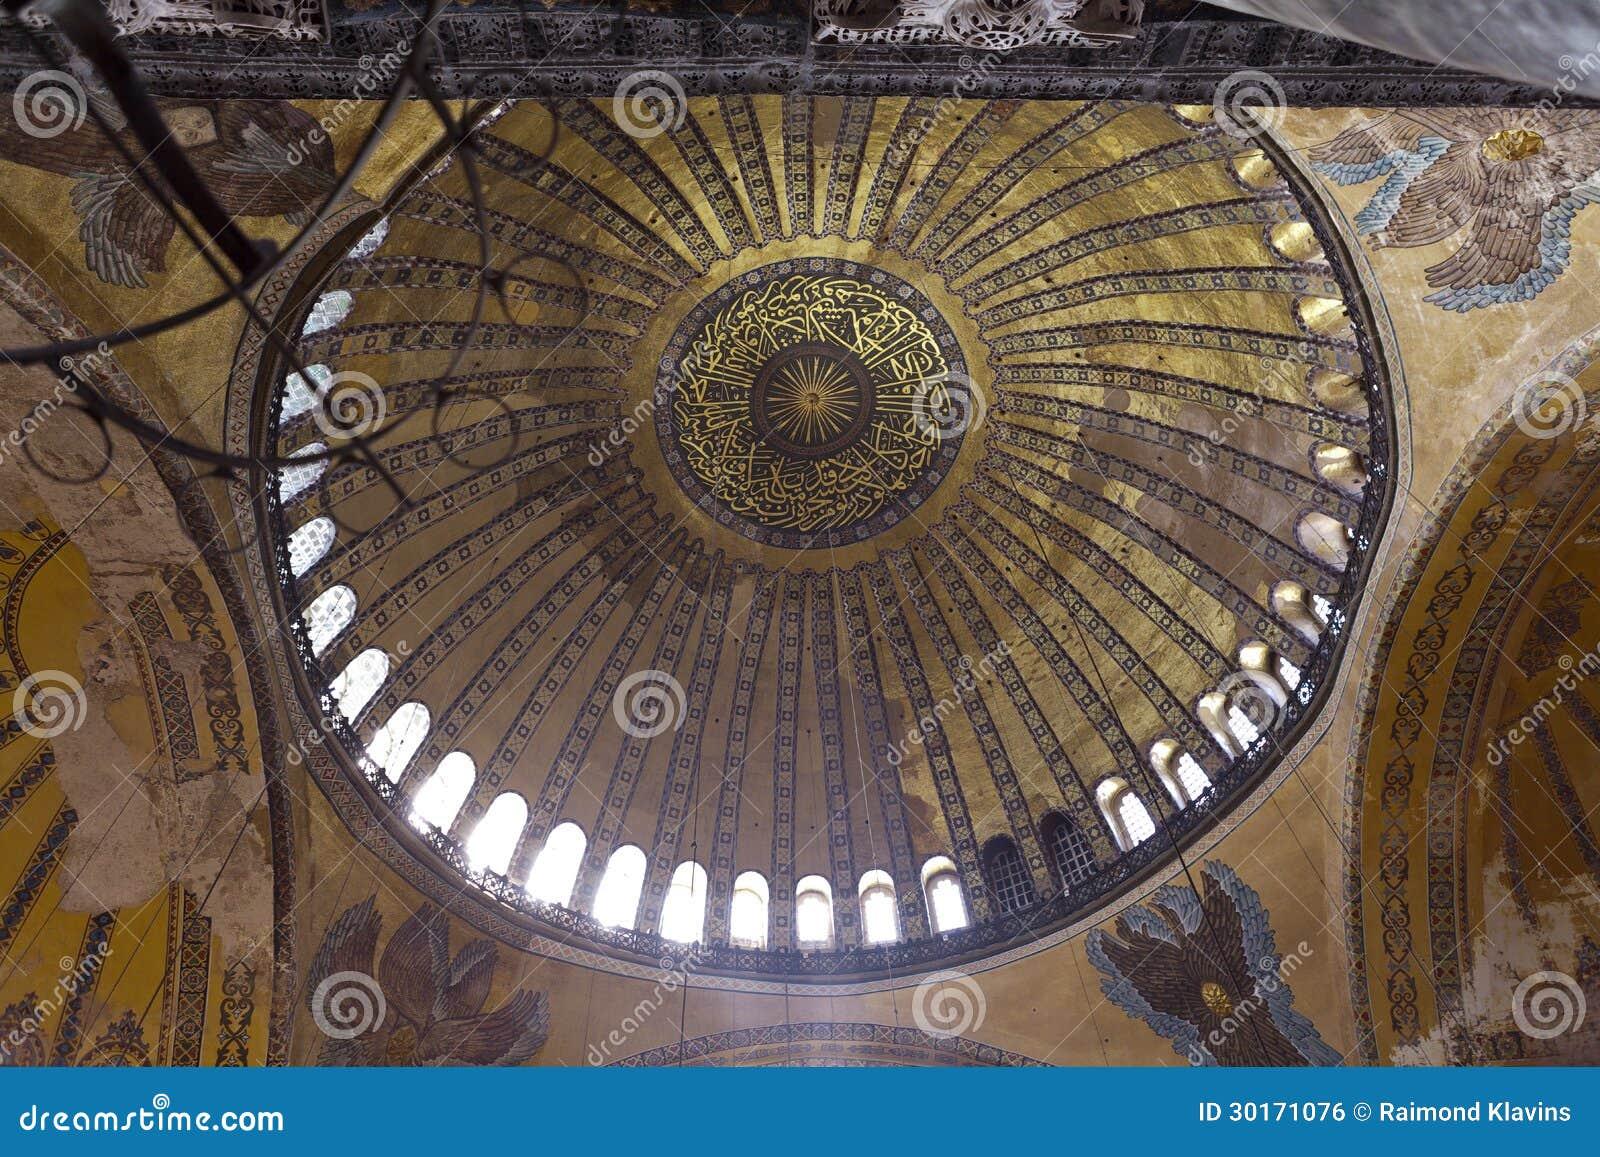 Aya Sophia in Istanbul Turkey inside